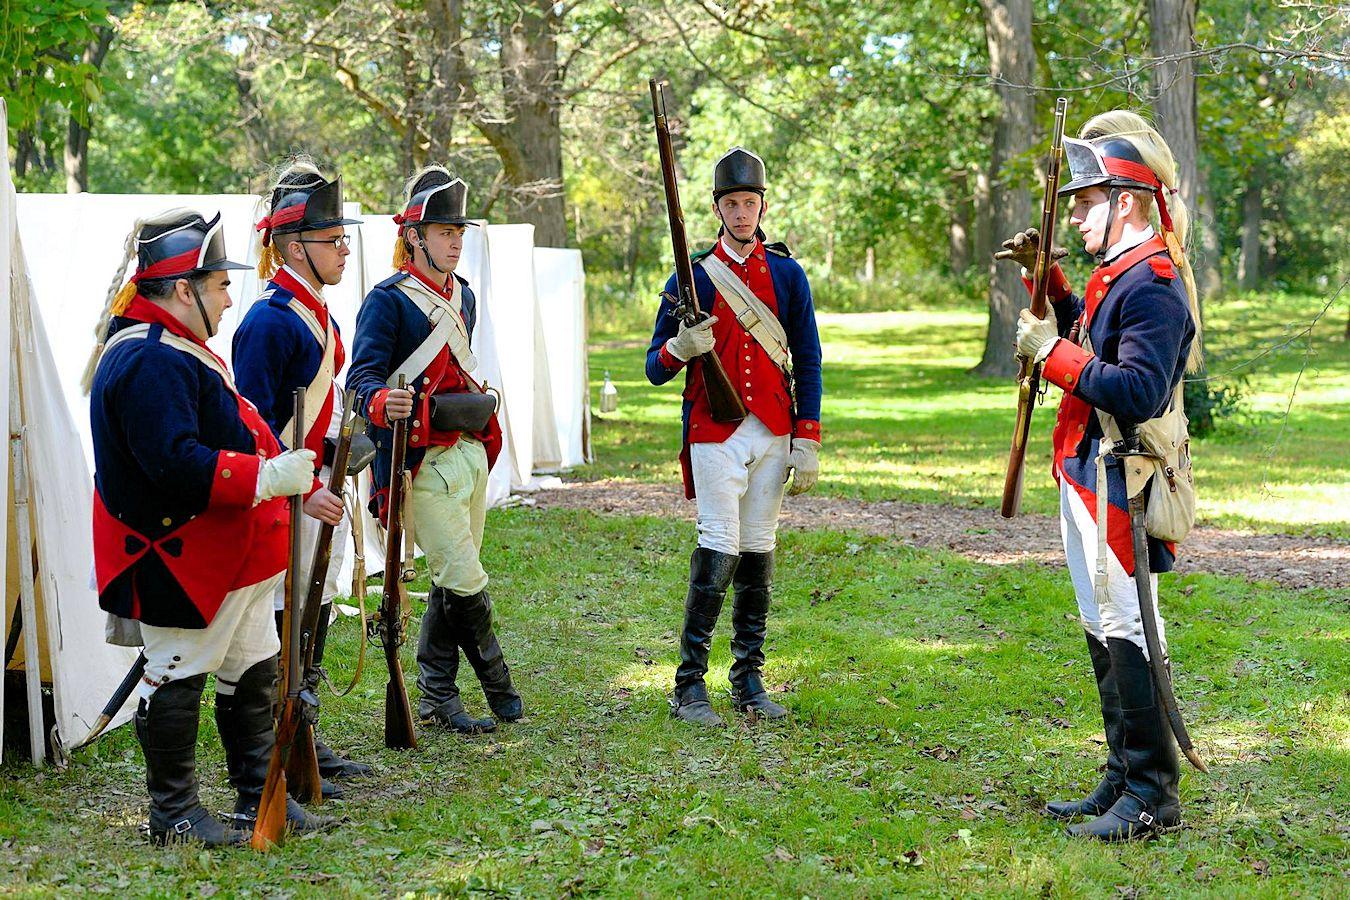 2019 Cantigny Revolutionary War Reenactment | Cantigny Park